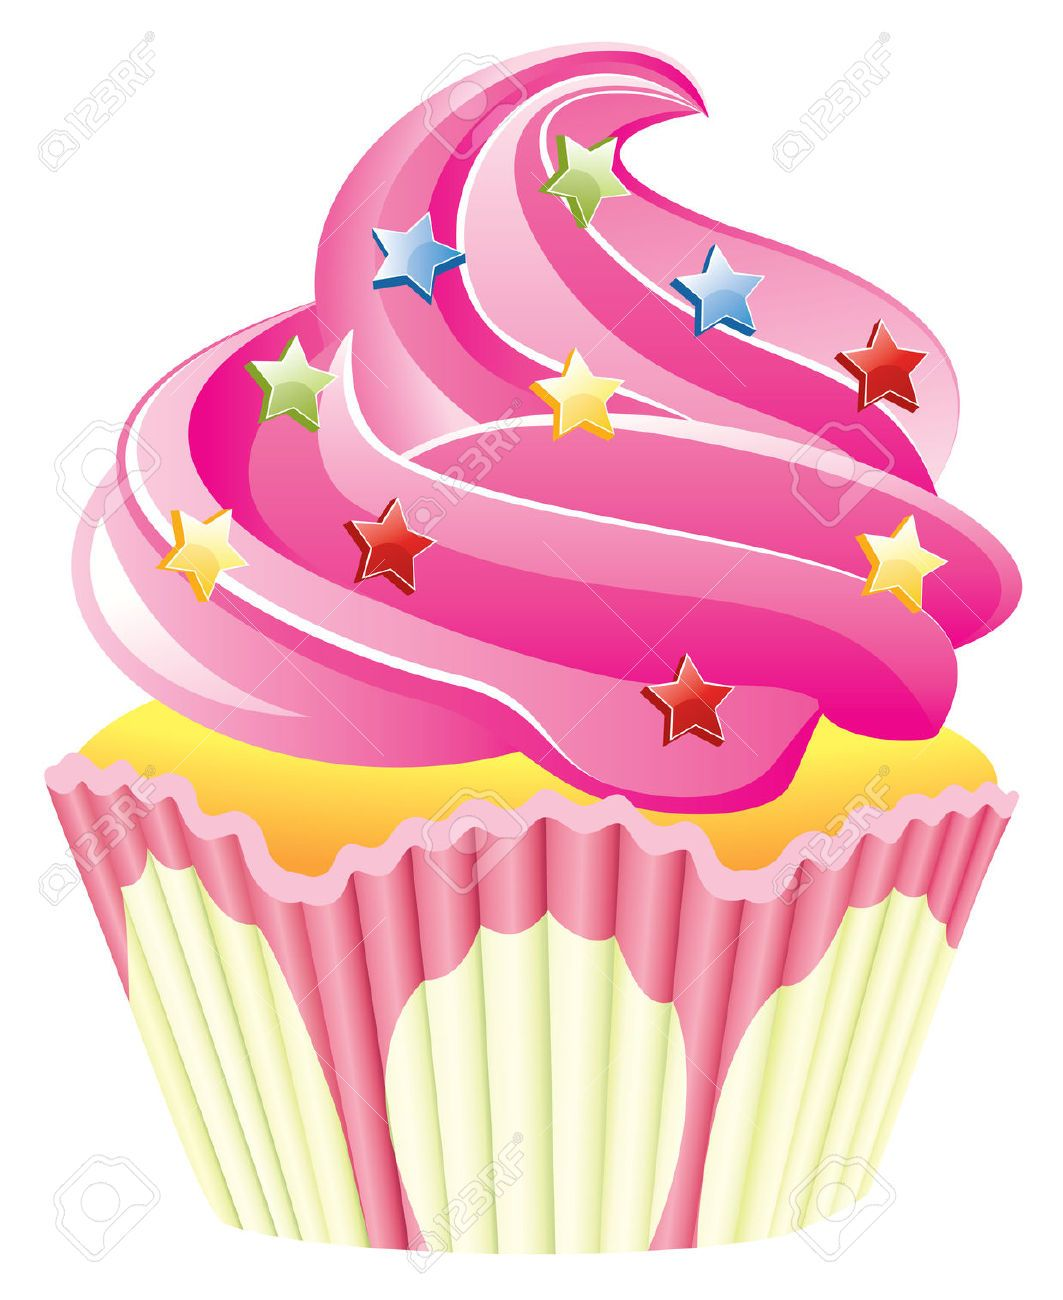 cute cupcake clip art pink cupcake pink cupcake with